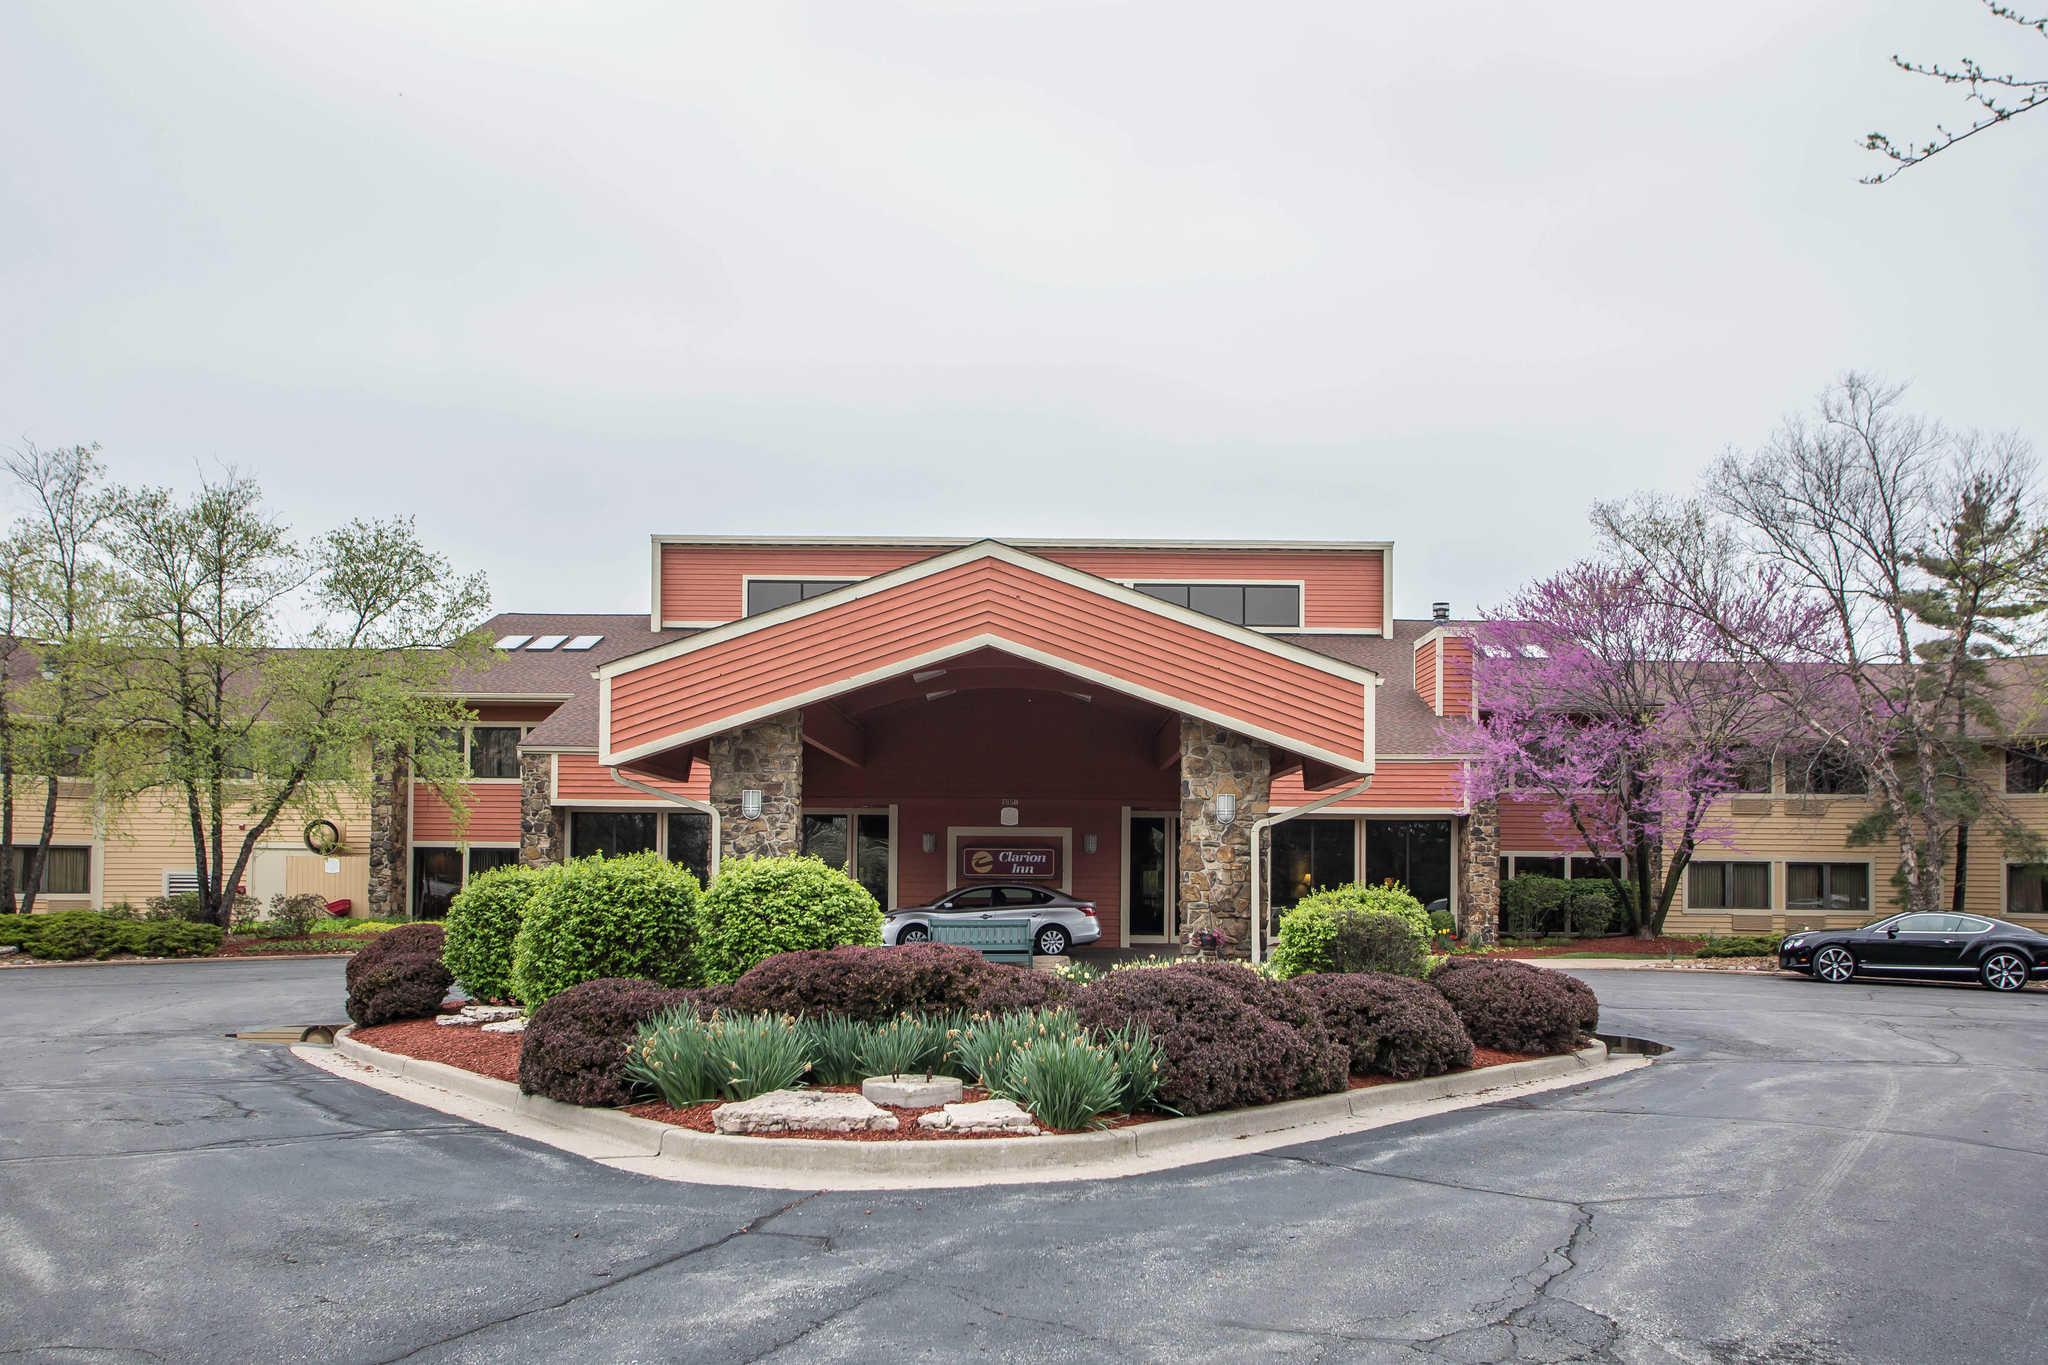 Clarion Inn image 2